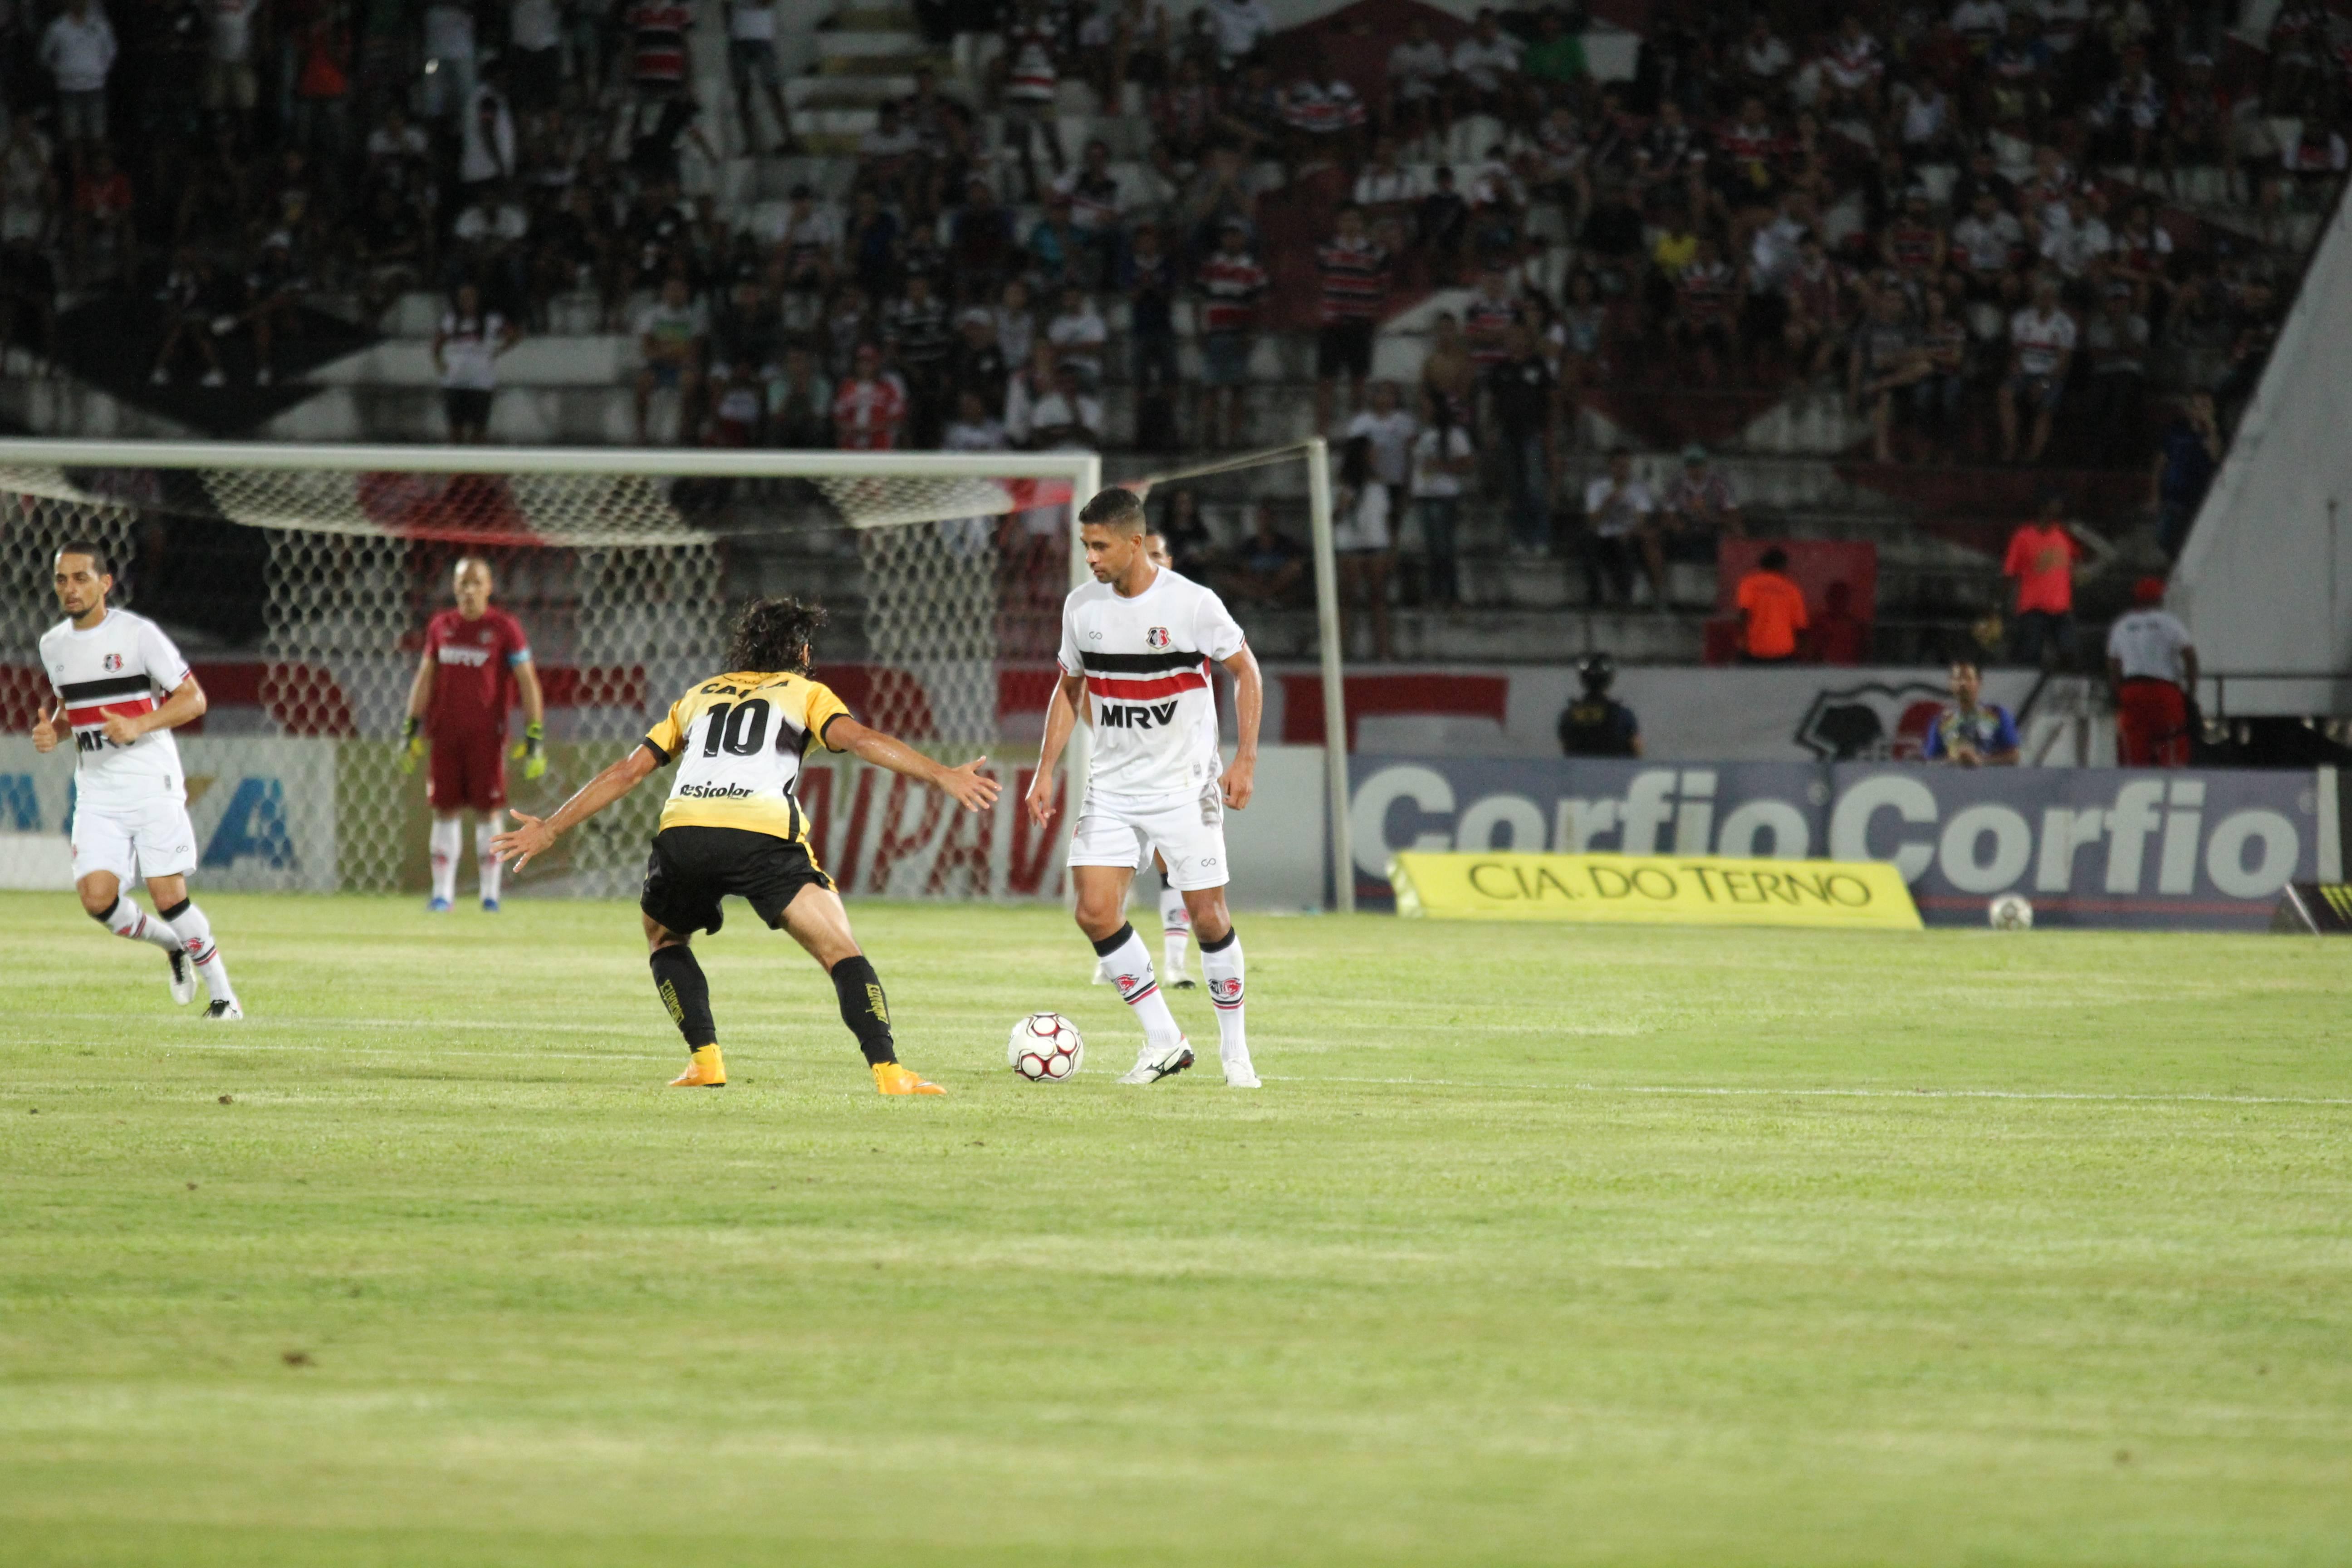 08-08-17-santa-cruz-1x2-criciuma-credito-rodrigo-baltar-138